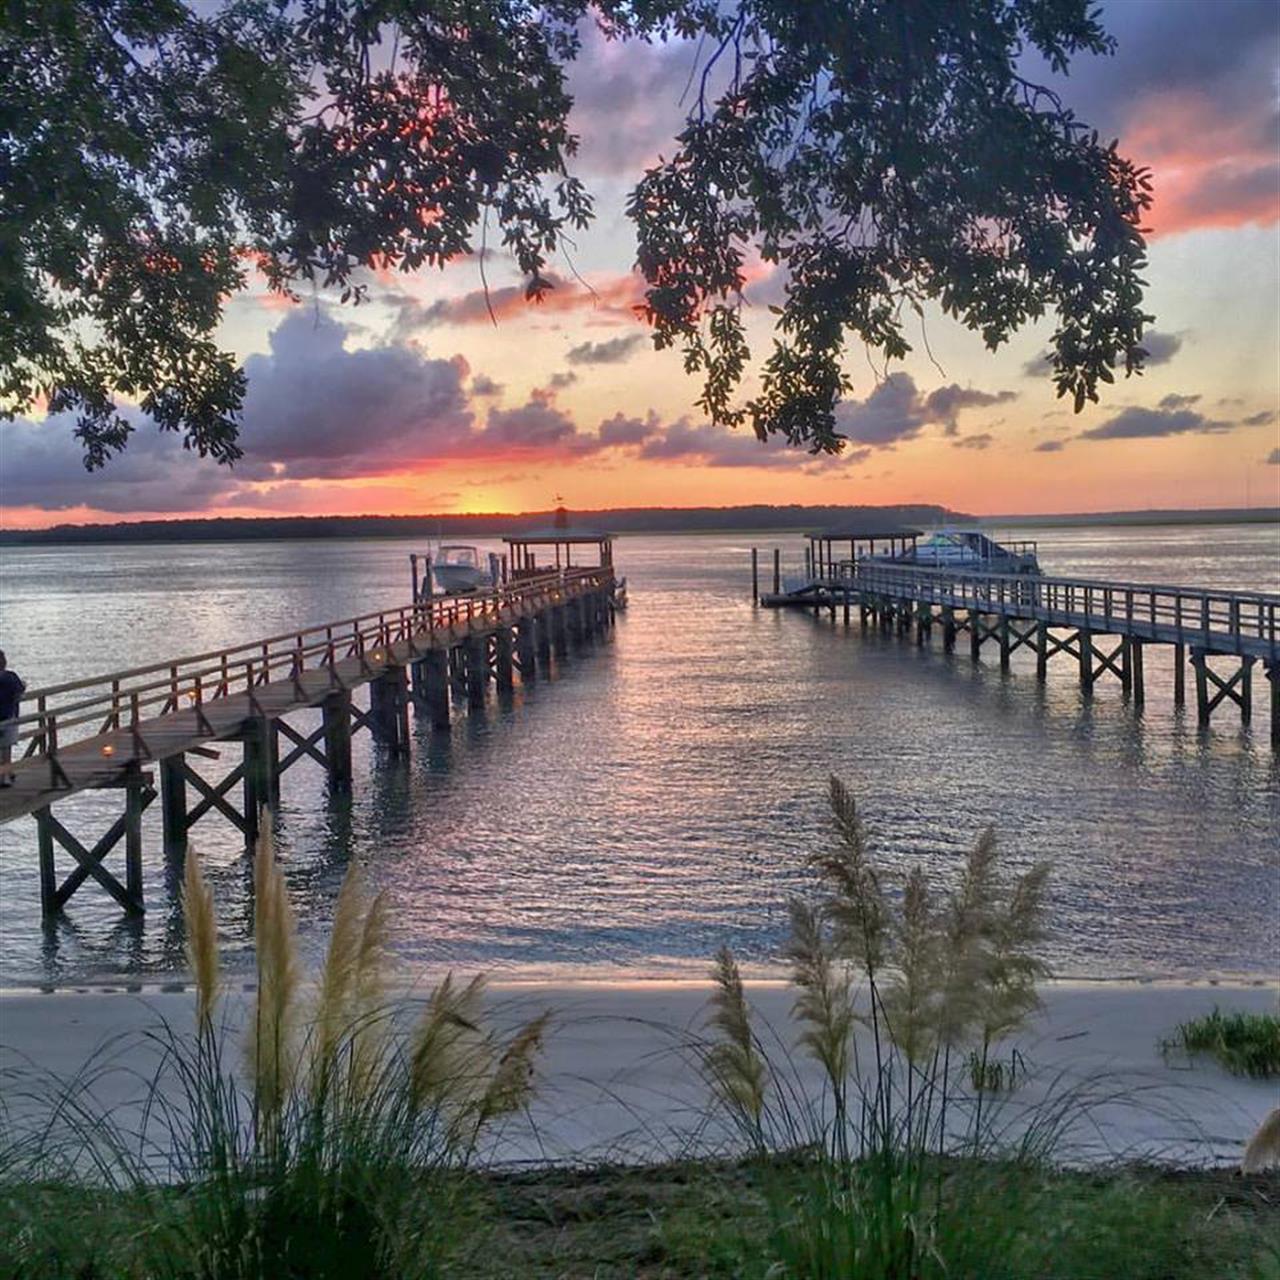 #LeadingRElocal - Spanish Wells, Hilton Head Island.